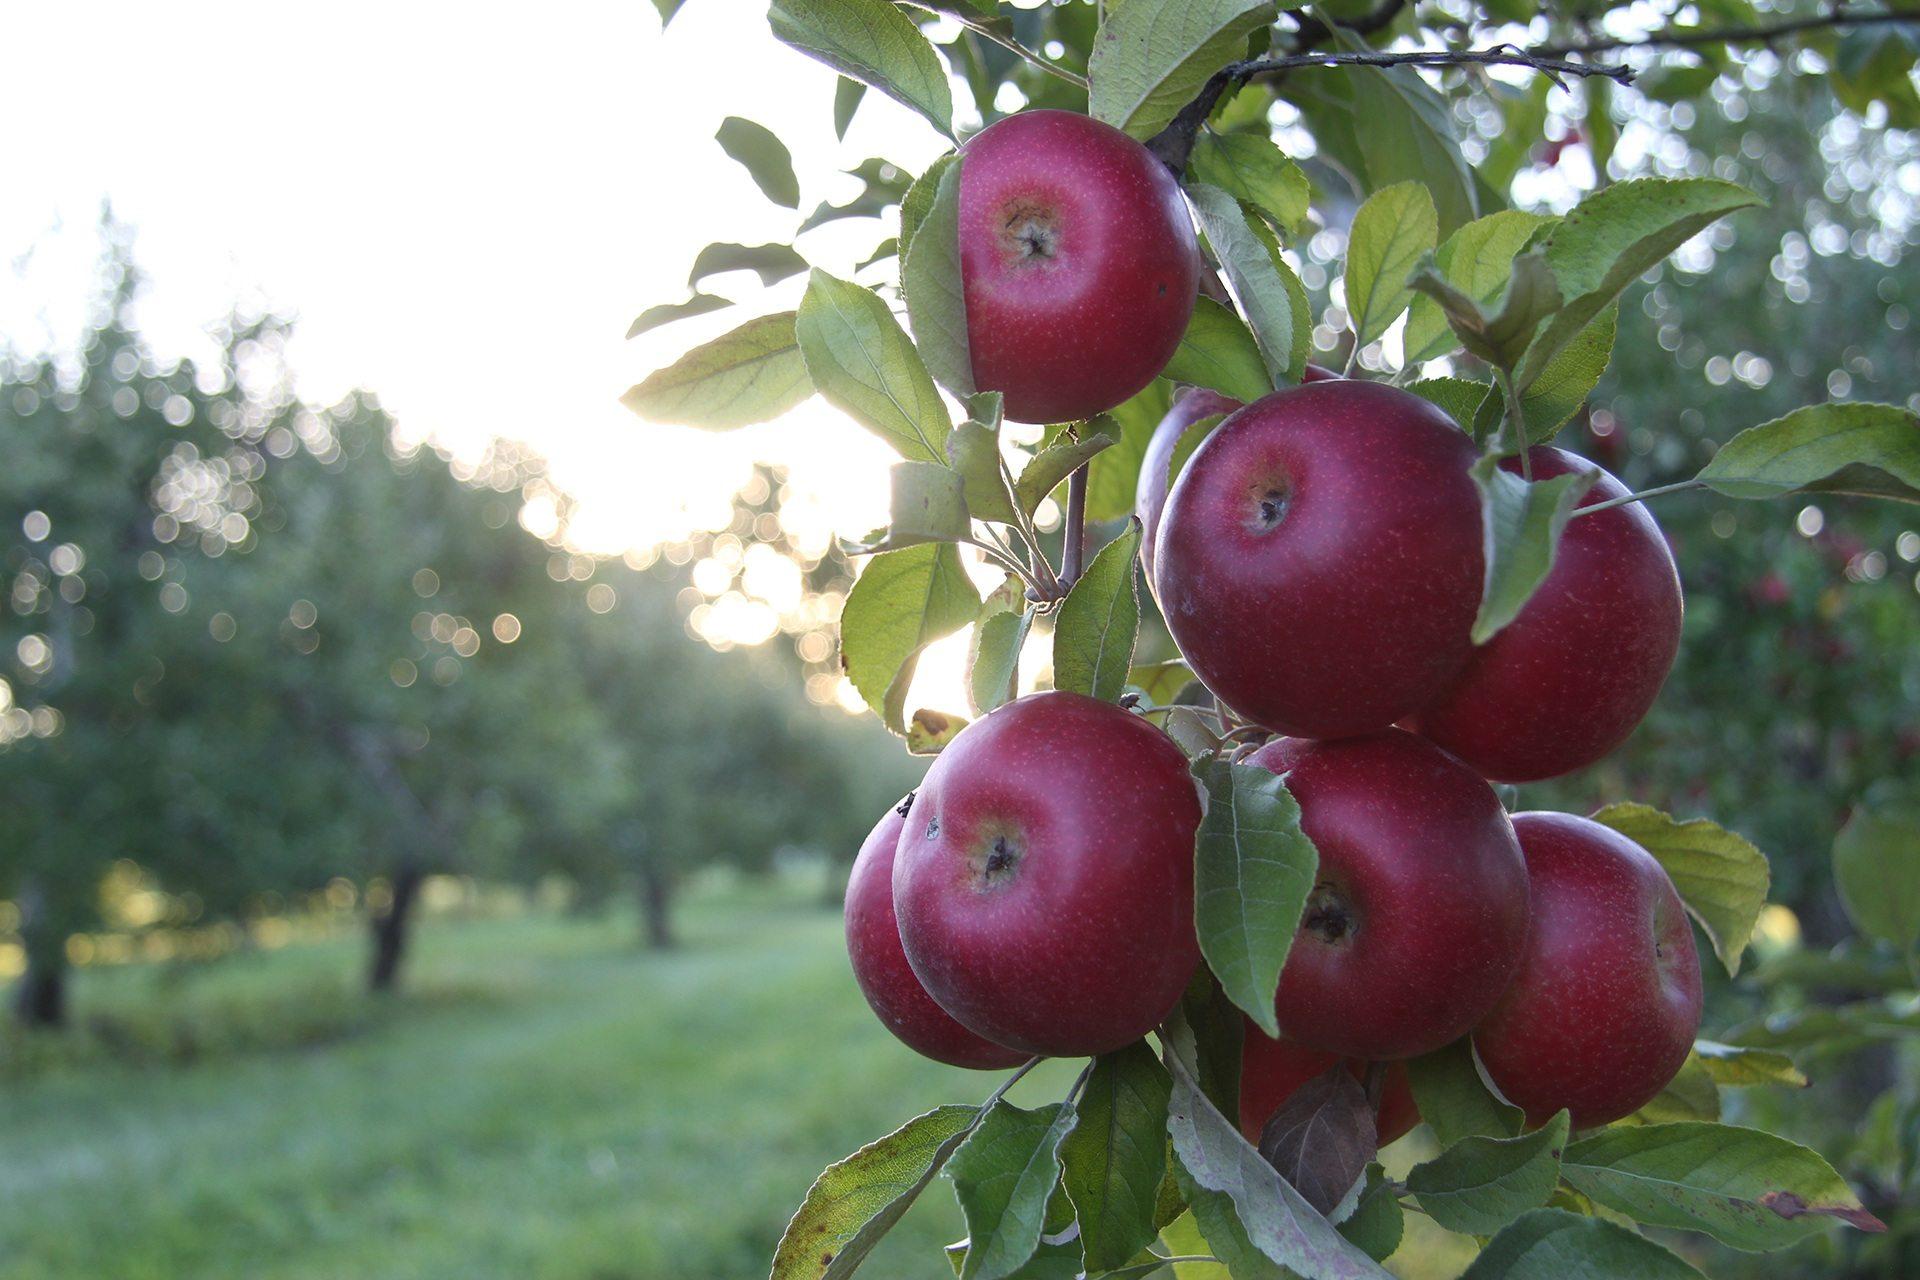 Yummy Red Apple Tree Wallpaper 1920x1280p Apple Tree 1920x1280 Wallpaper Teahub Io